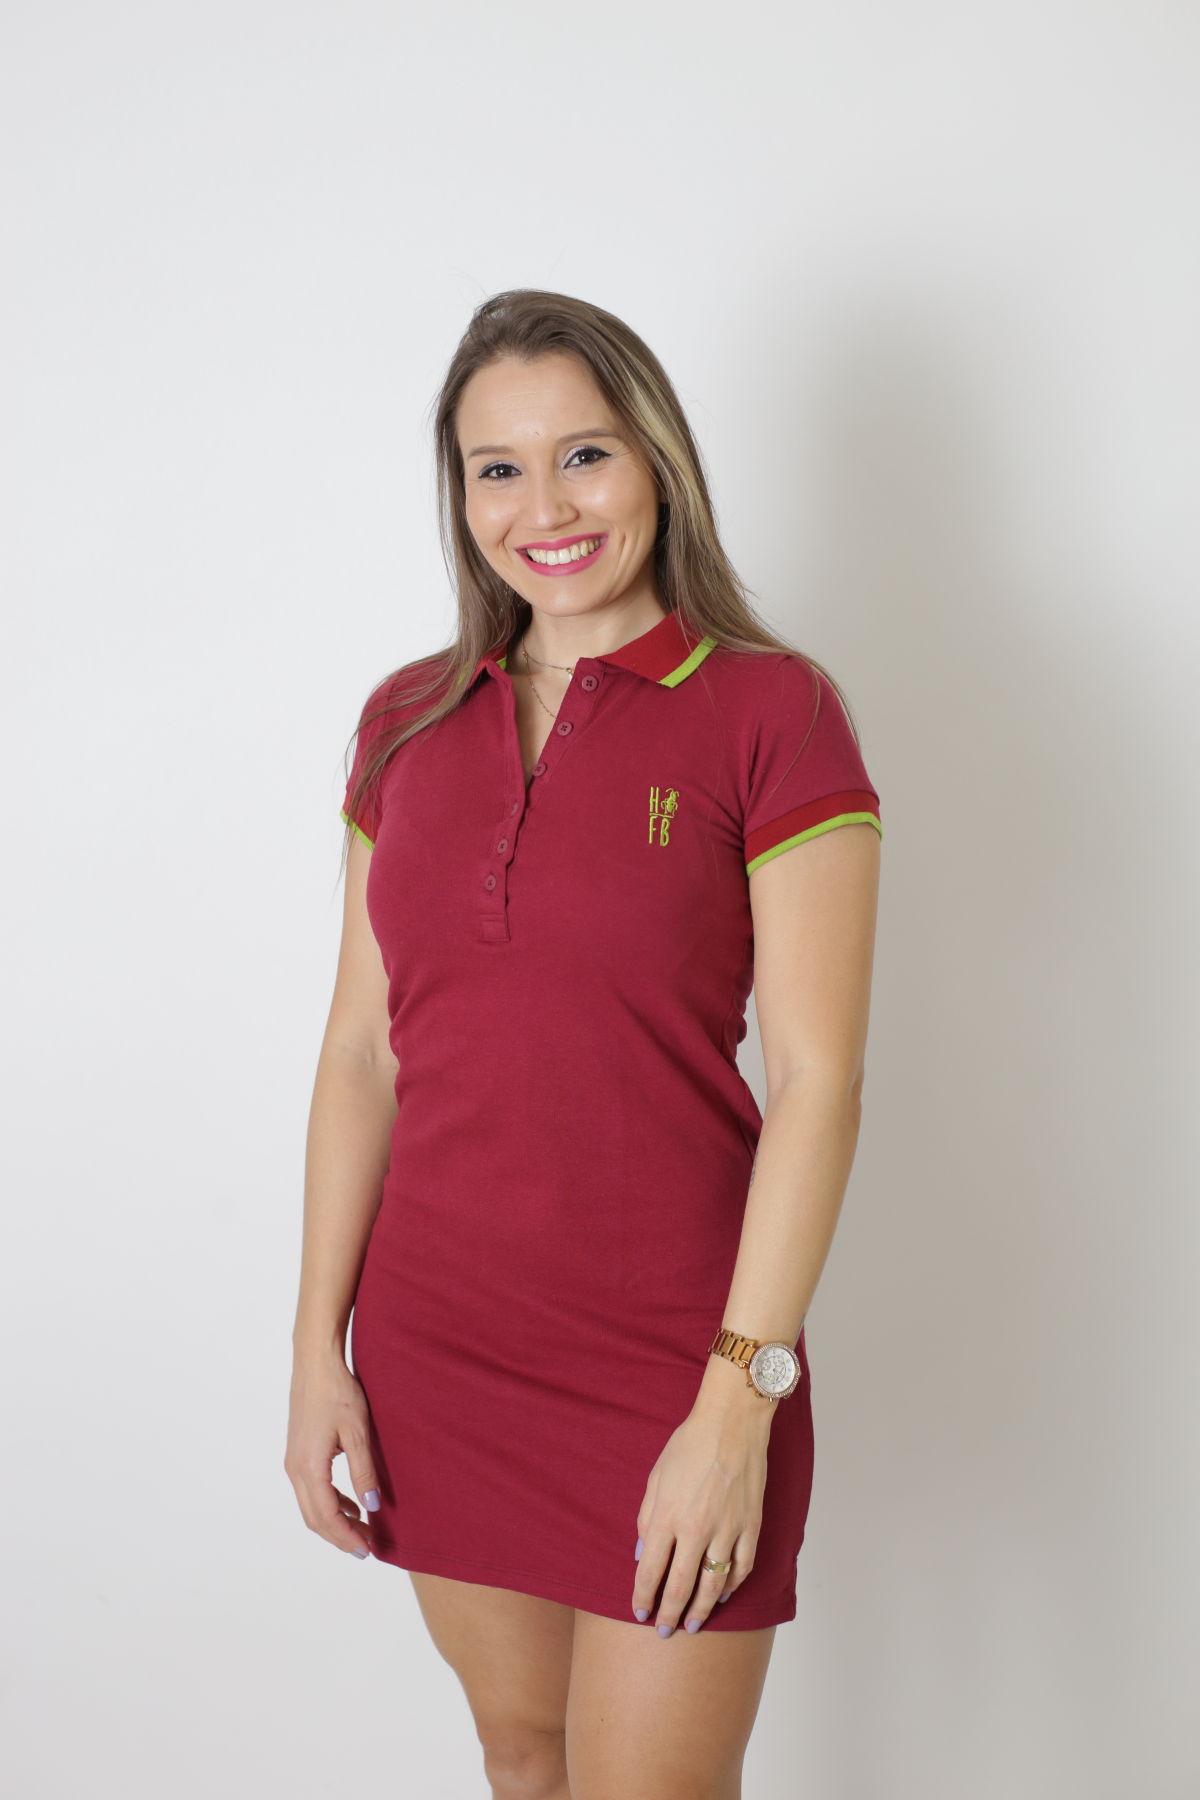 MÃE E FILHO > Kit 02 peças Vestido + Body Unissex Polo - Bordo [Coleção Tal Mãe Tal Filho]  - Heitor Fashion Brazil